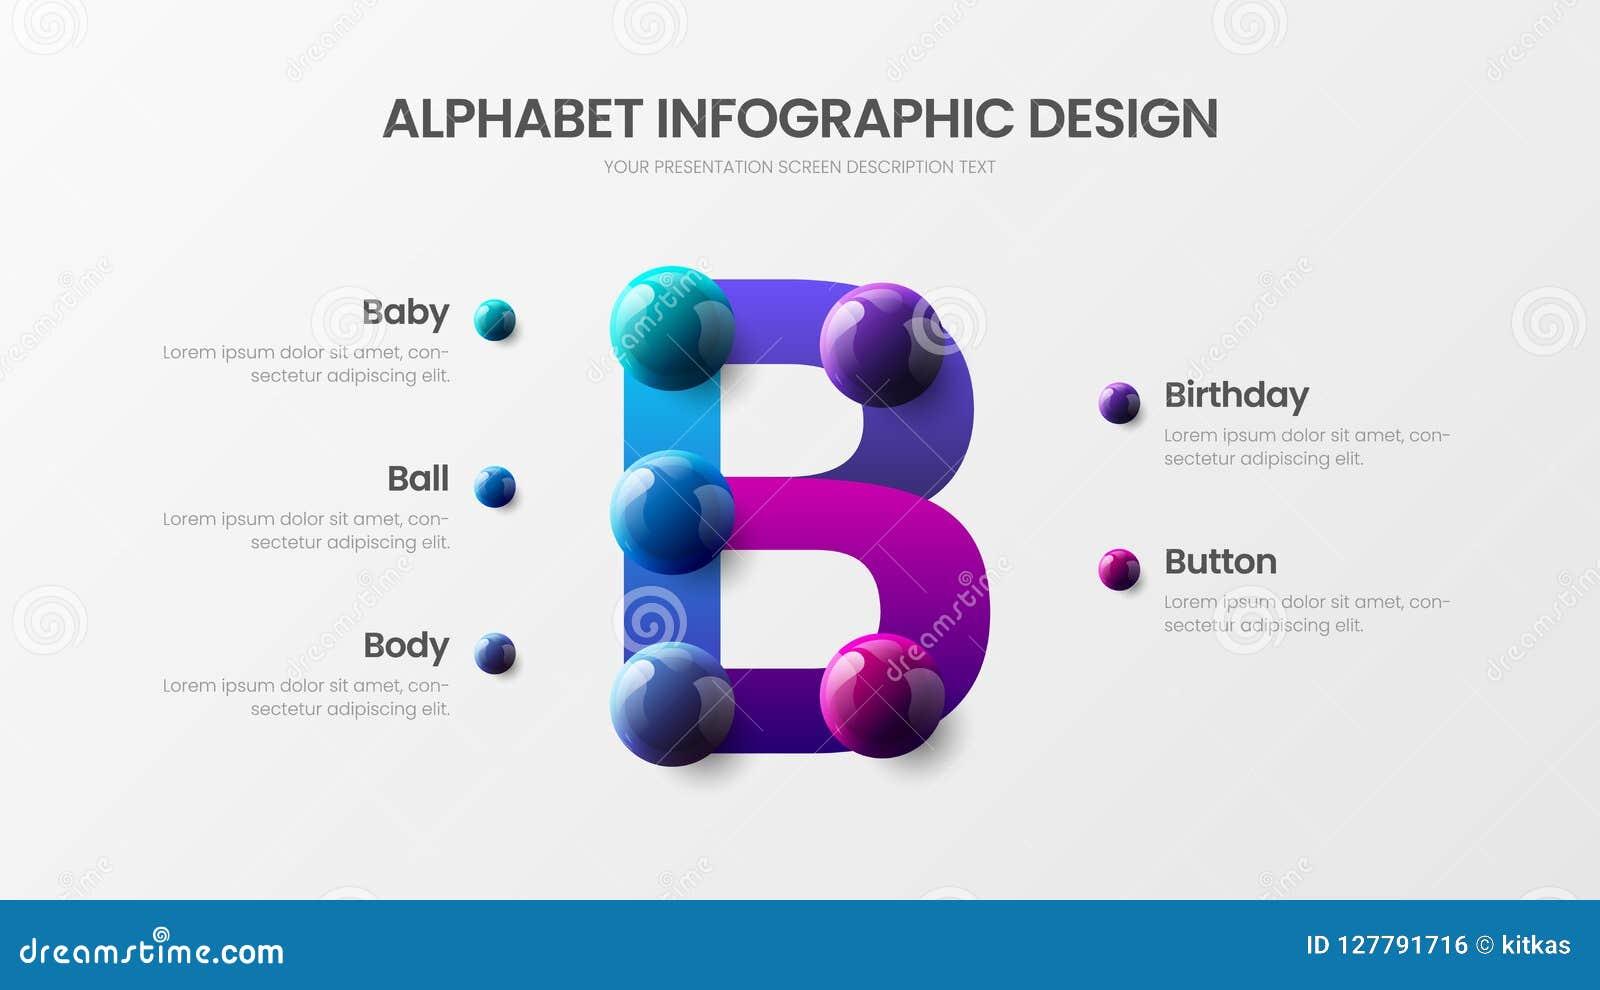 Creative bright multicolor character design illustration layout. Modern art B symbol graphics visualization template.